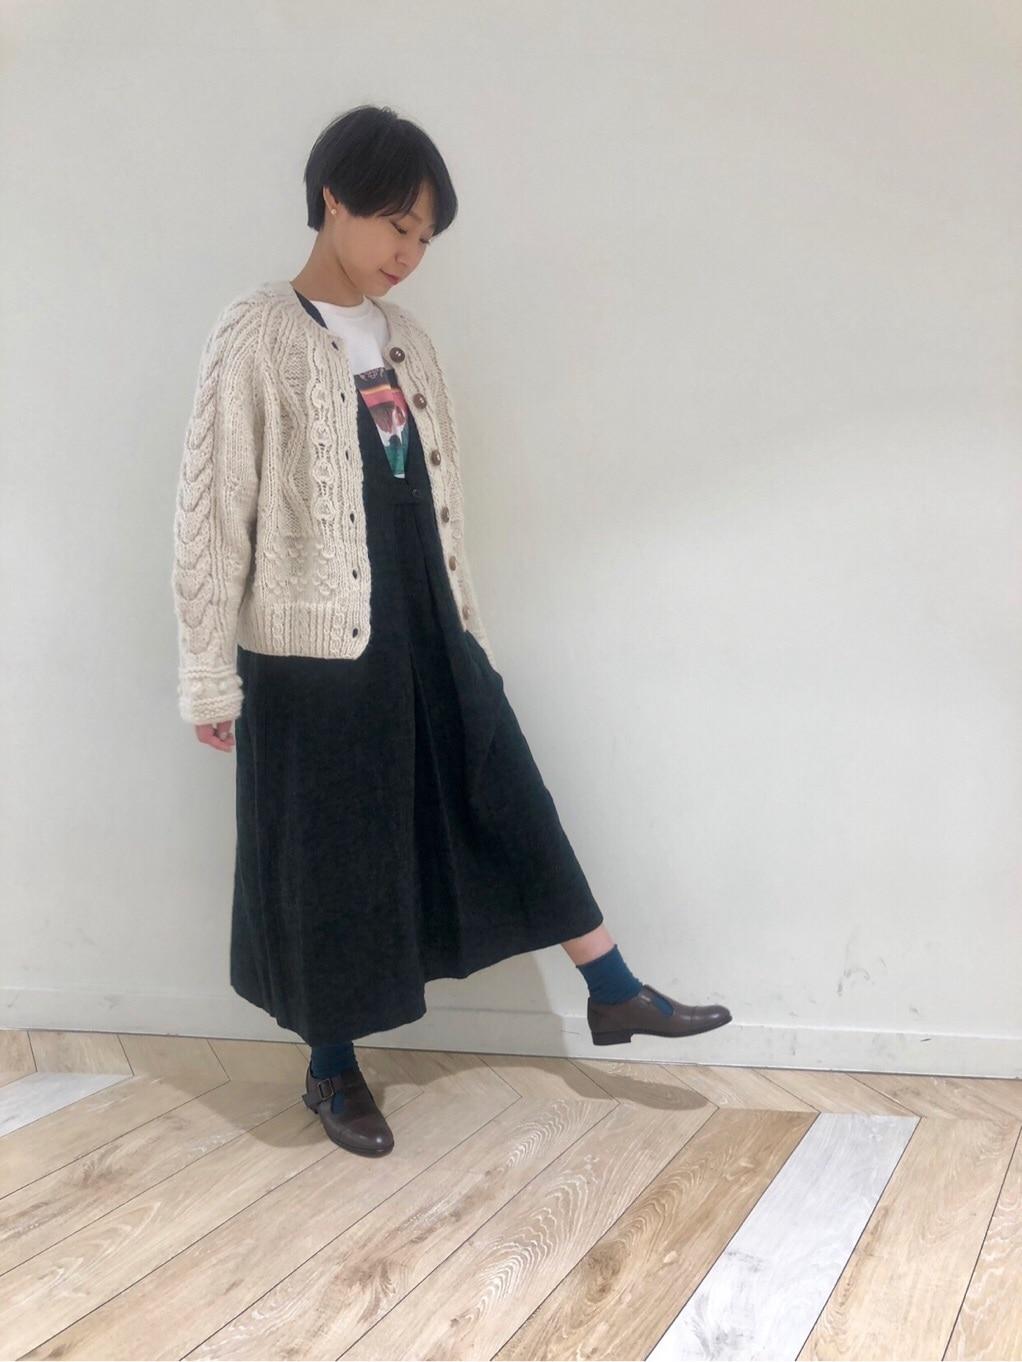 bulle de savon 吉祥寺パルコ 身長:158cm 2019.09.25